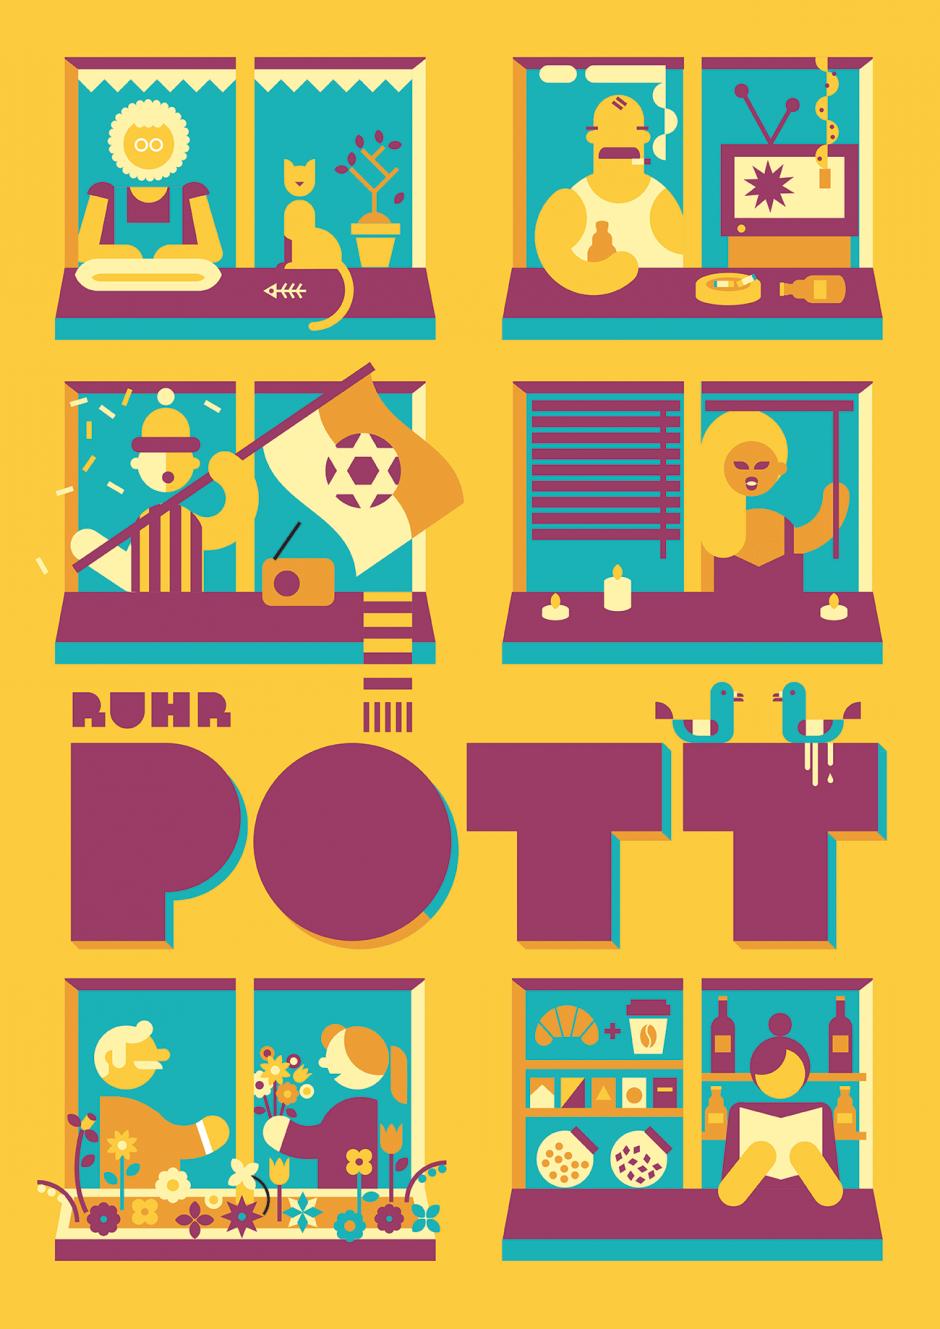 Plakat: Ruhrpott